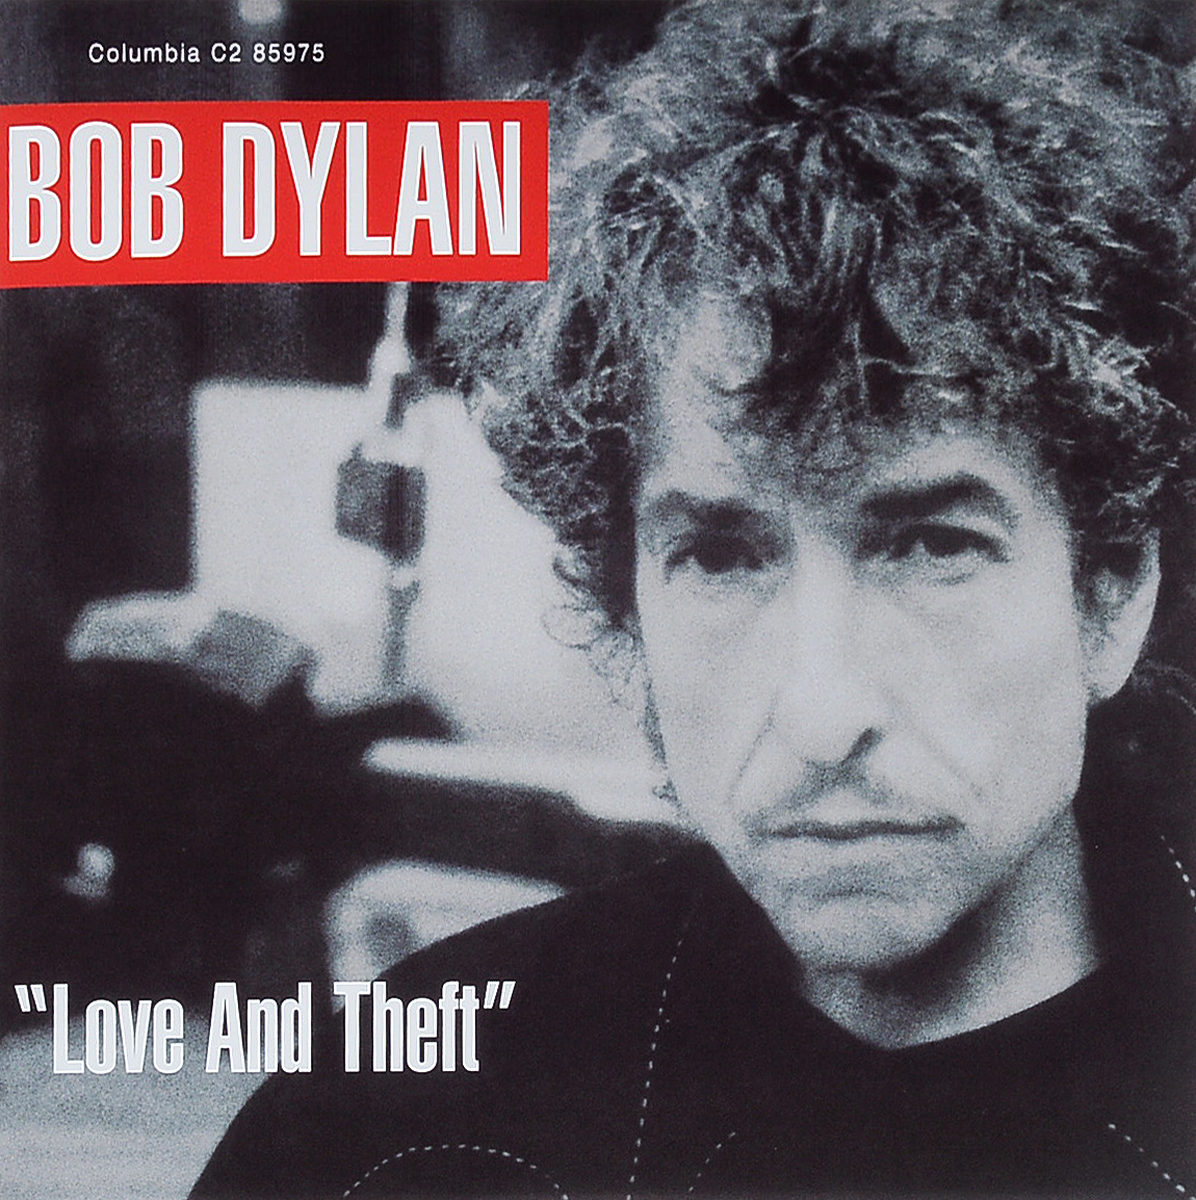 Боб Дилан Bob Dylan. Love And Theft (2 LP) bob dylan bob dylan love and theft 2 lp 180 gr